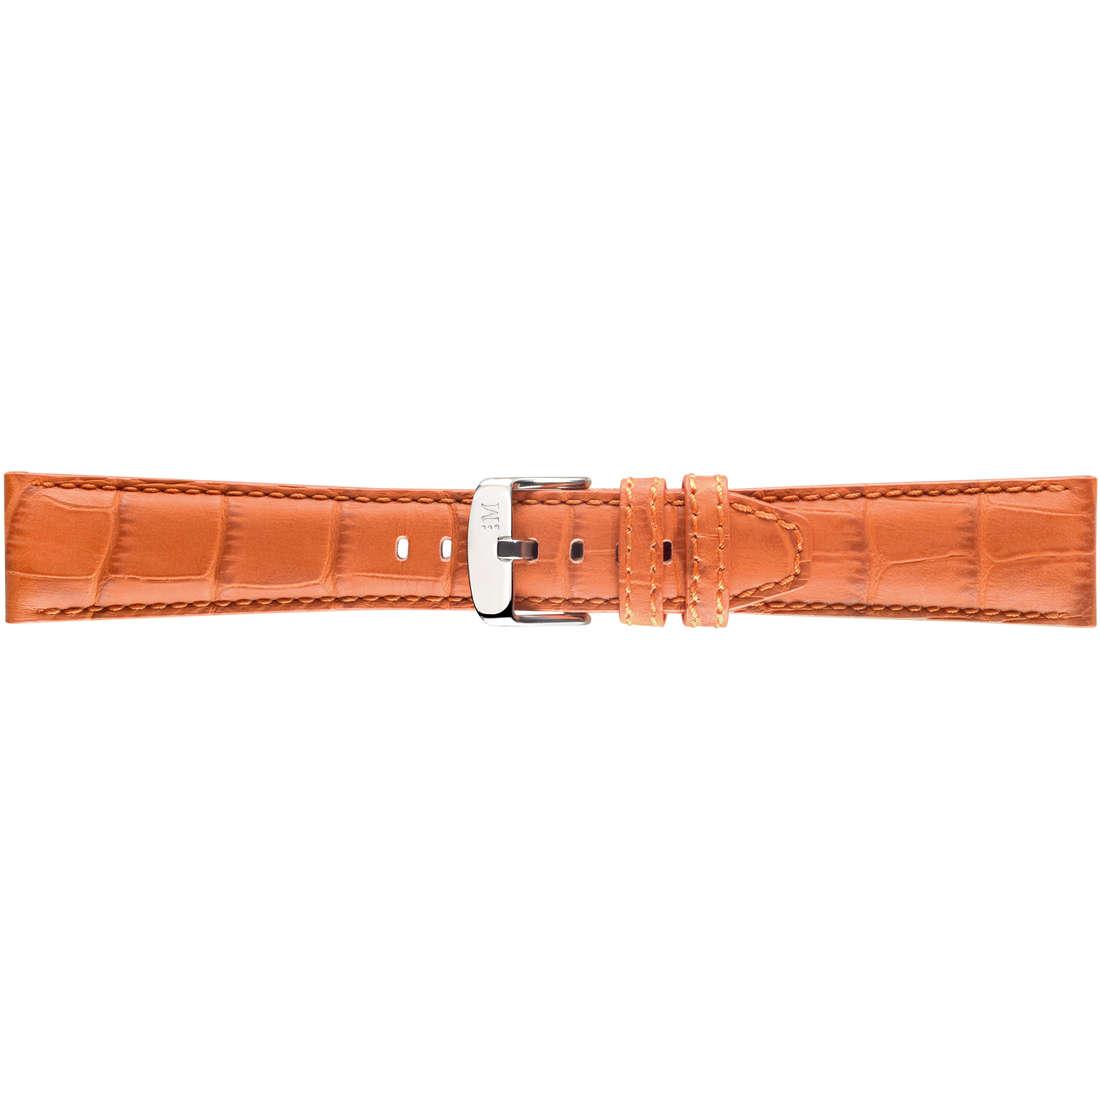 montre bande de montres homme Morellato Linea Sport A01X4497B44086CR20